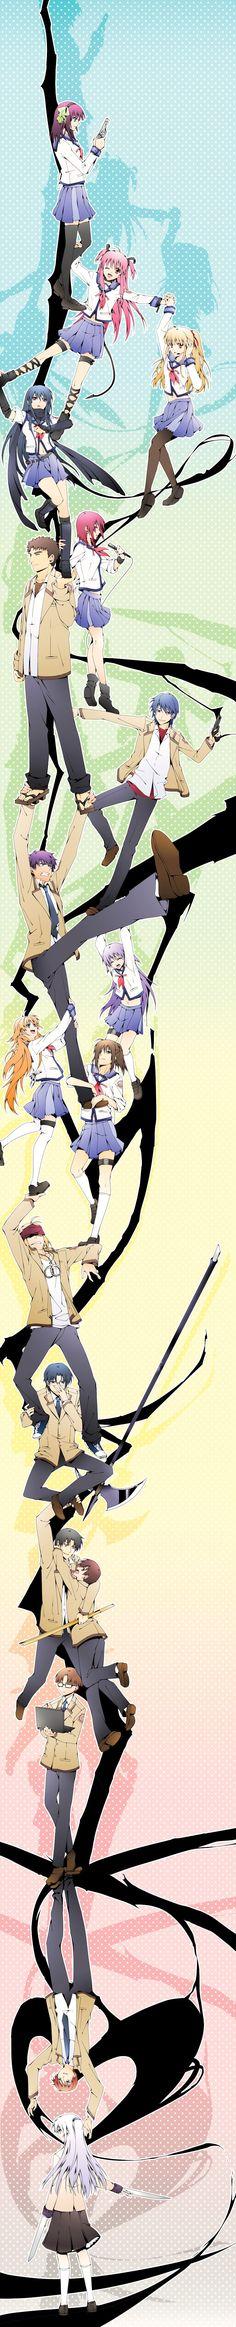 Trust me Durarara - Angel beats!... Otonashi, Hinata, Noda... This makes me sad for some reason...